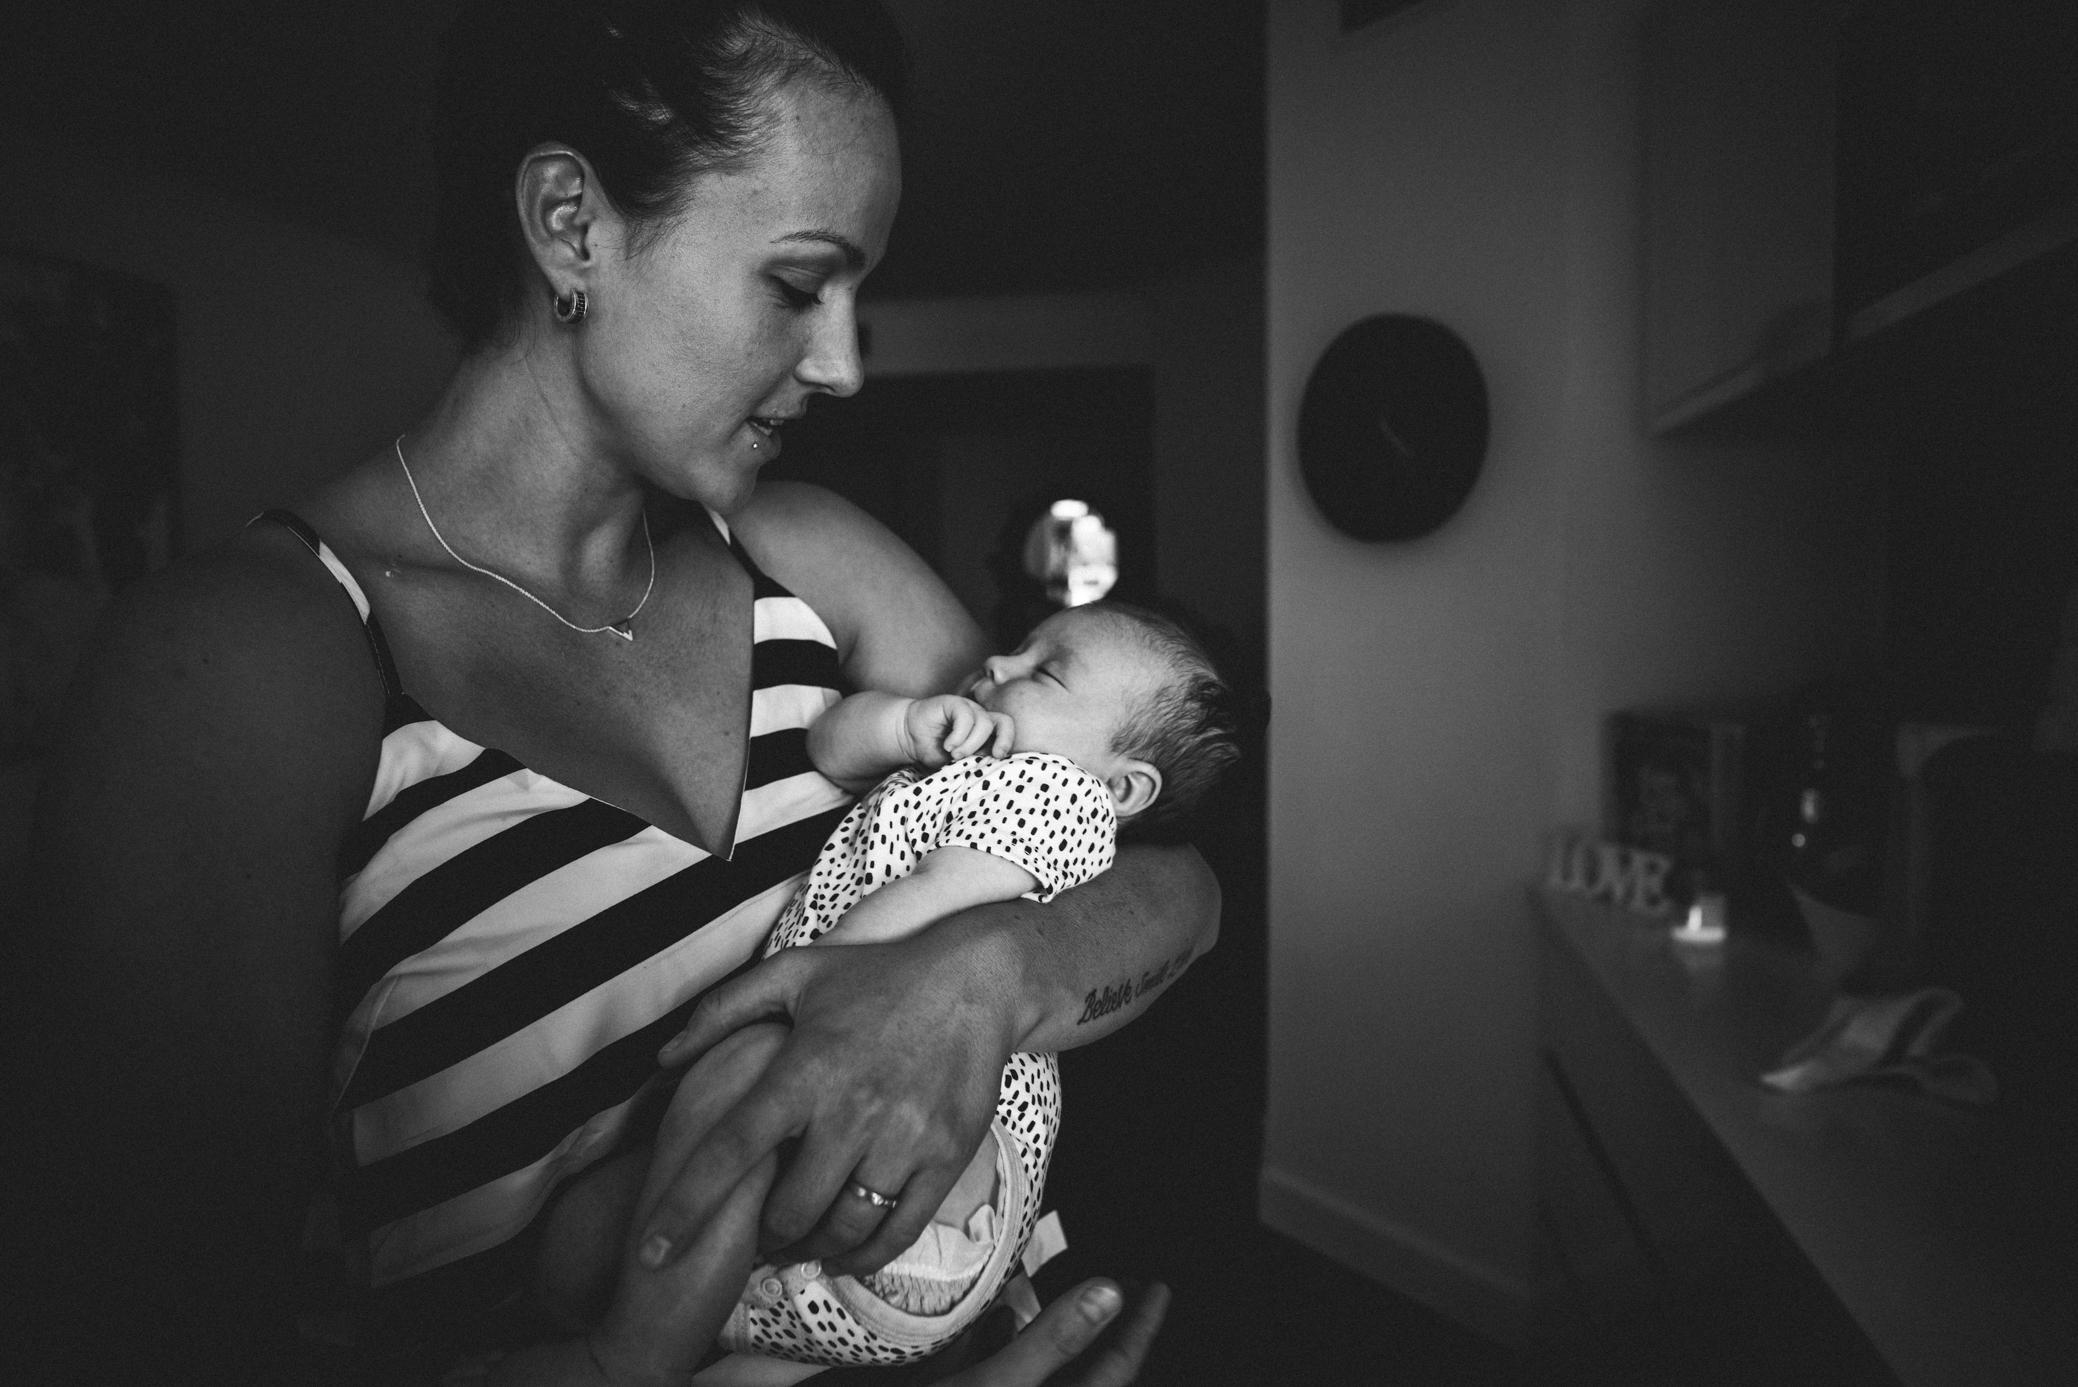 newborn-photographer-sydney-cindy-cavanagh (1 of 10).jpg